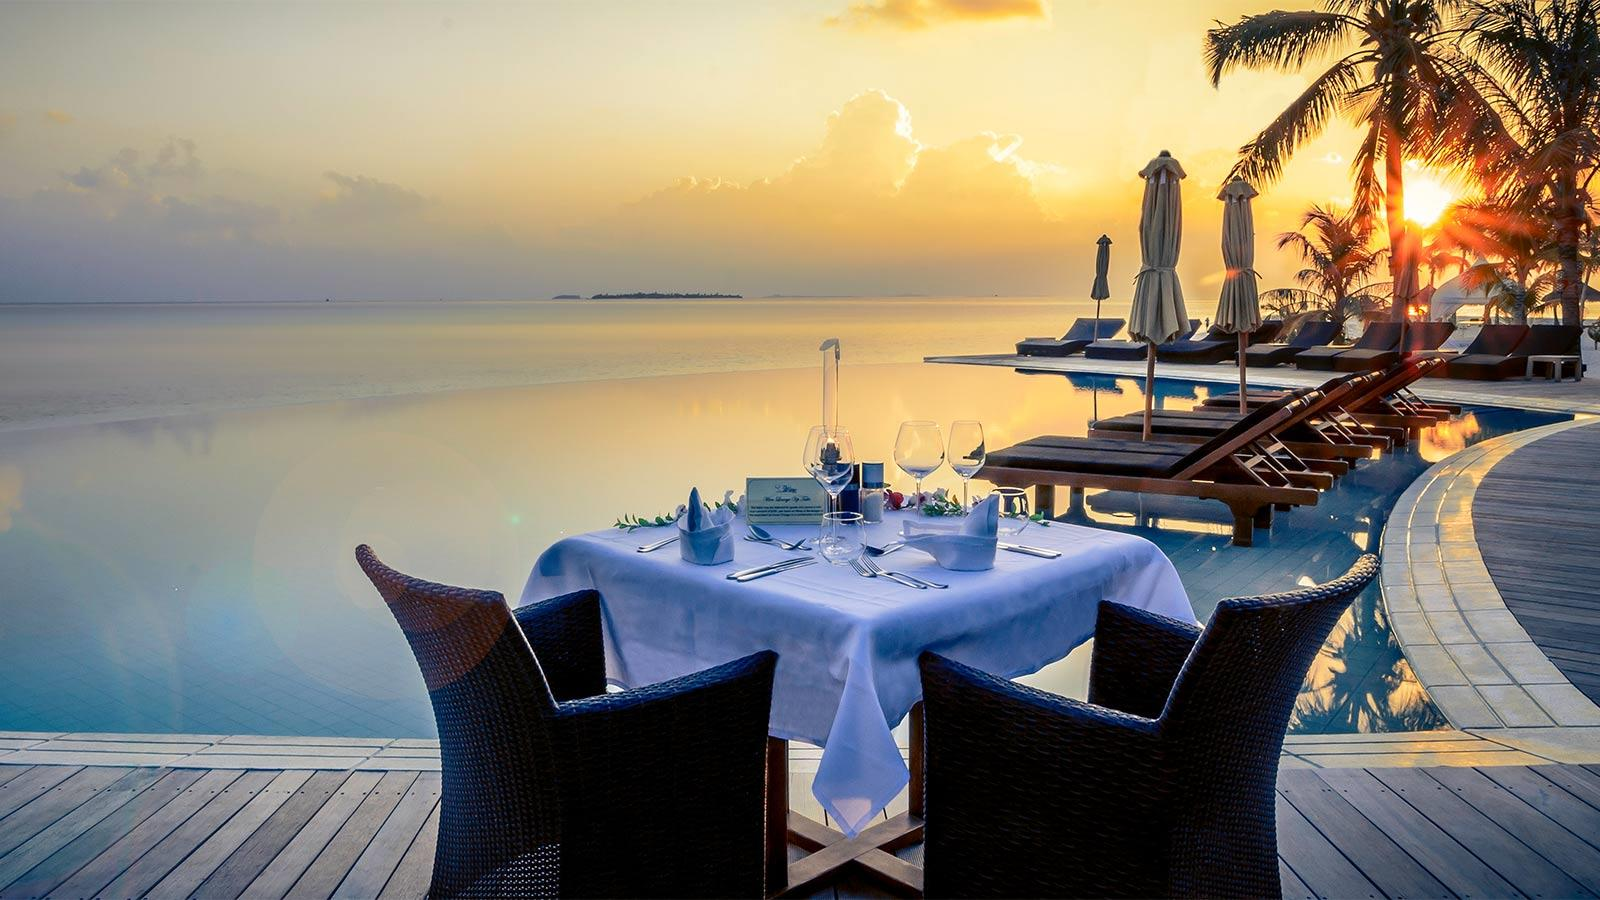 kuredu-island-resort-spa-genel-0020